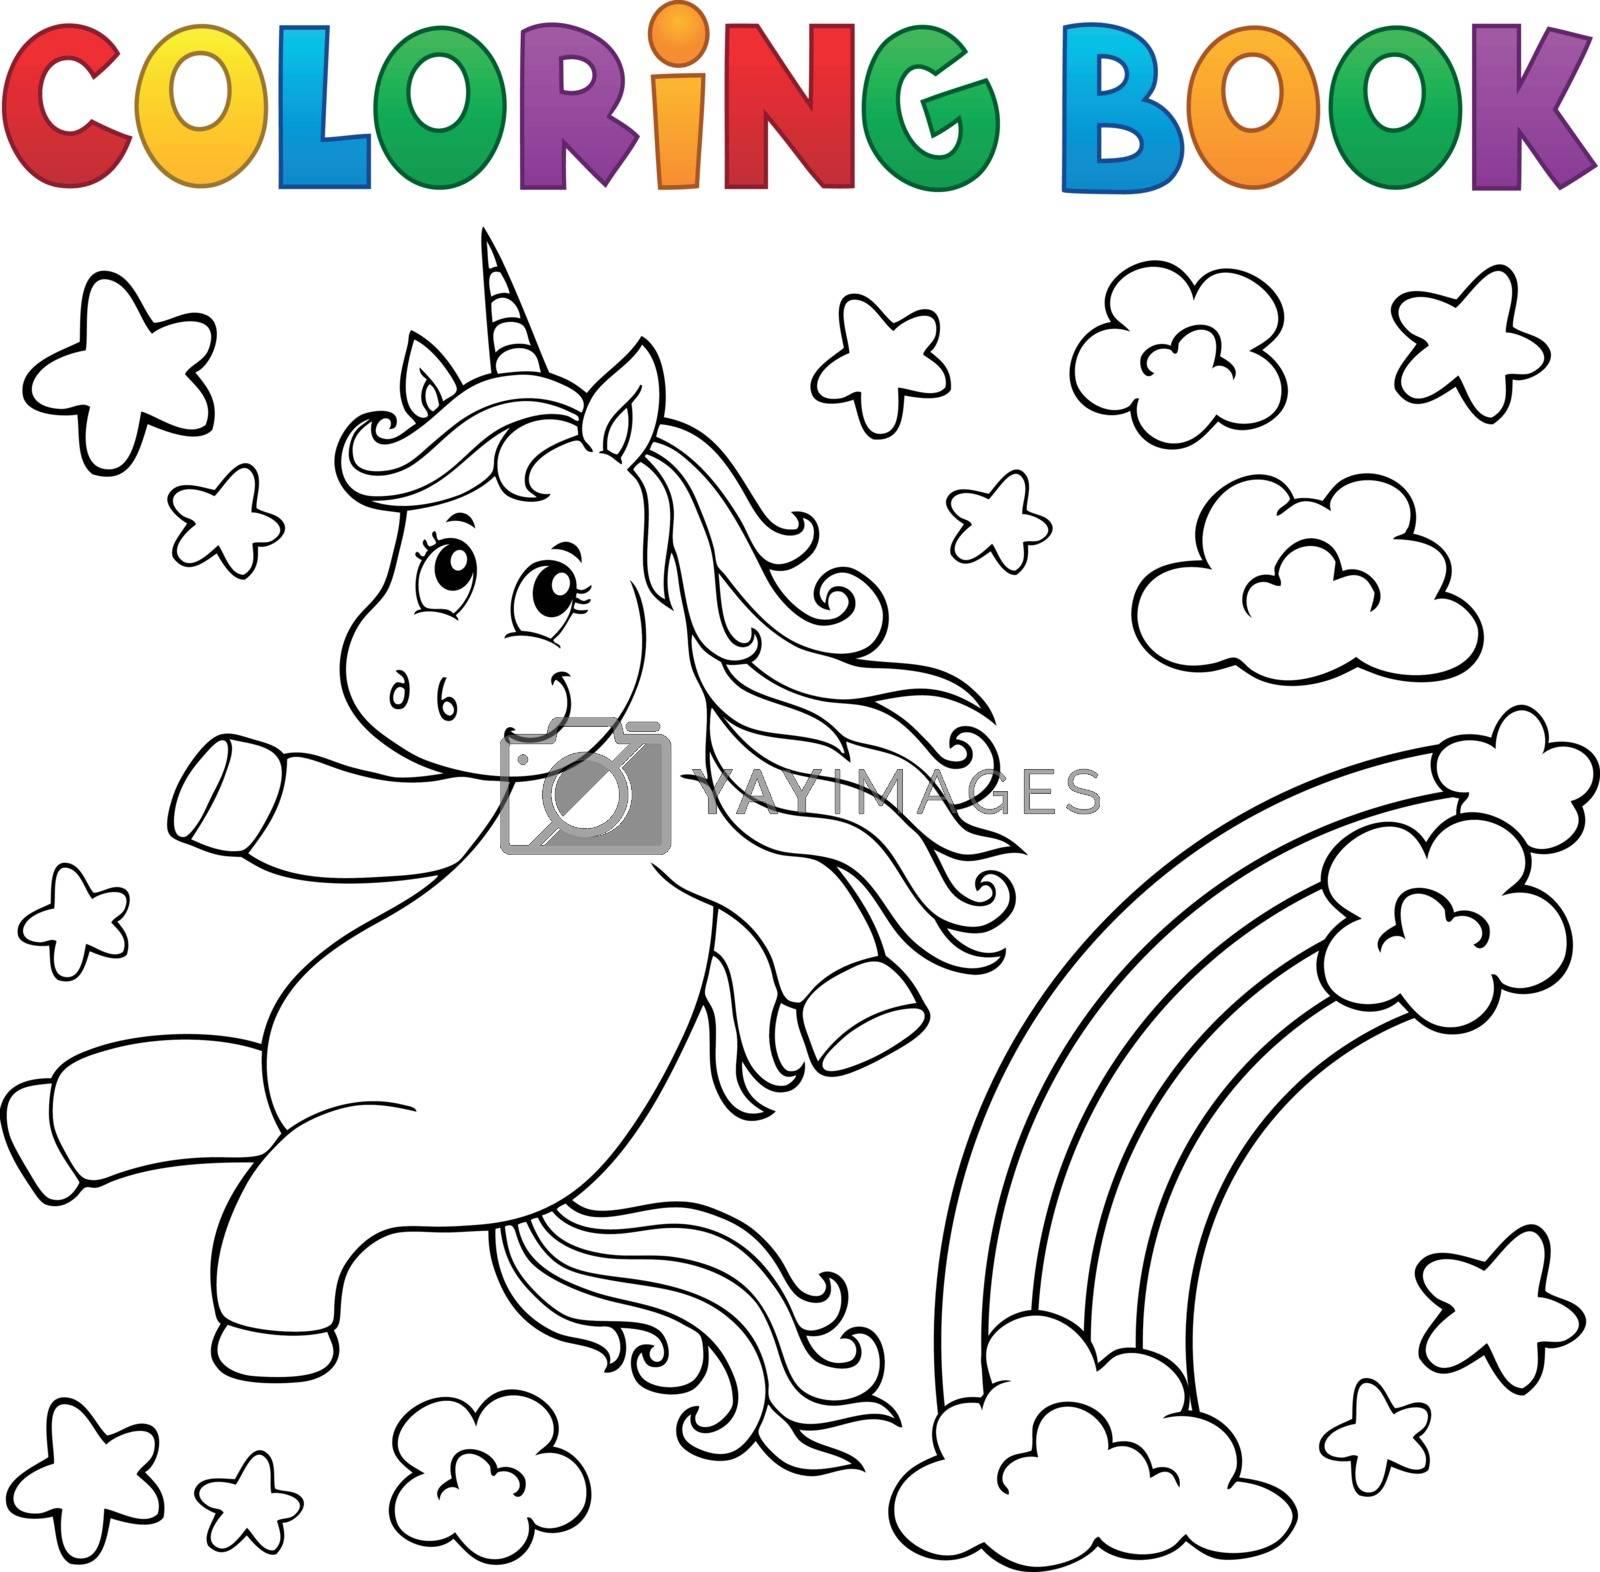 Coloring book cute unicorn topic 2 - eps10 vector illustration.